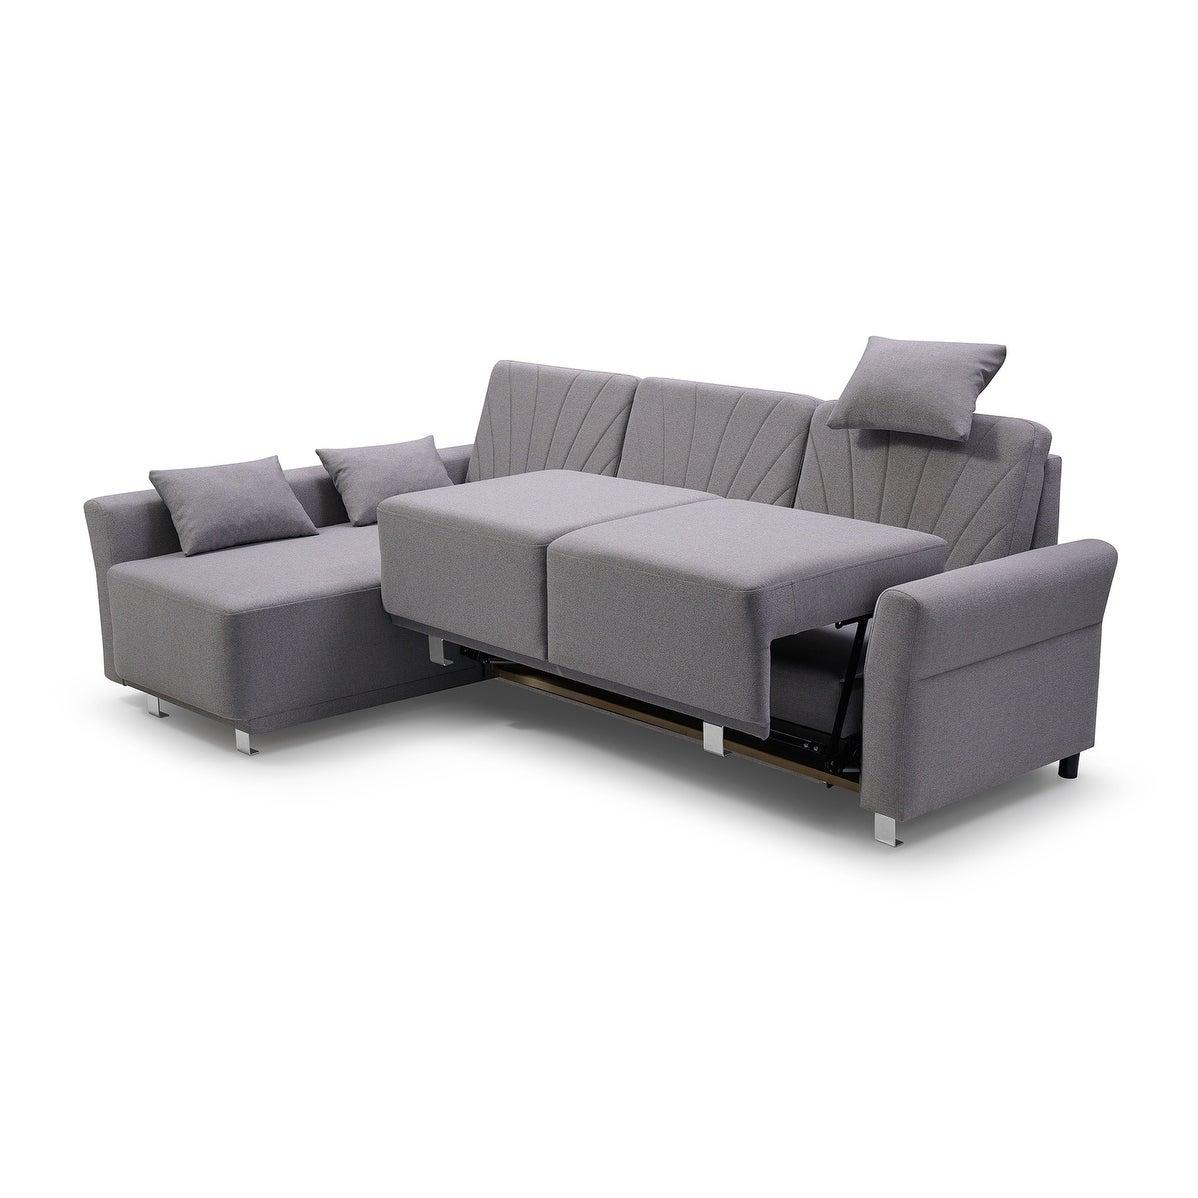 Molly Futon Sectional Sofa Bed Sleeper